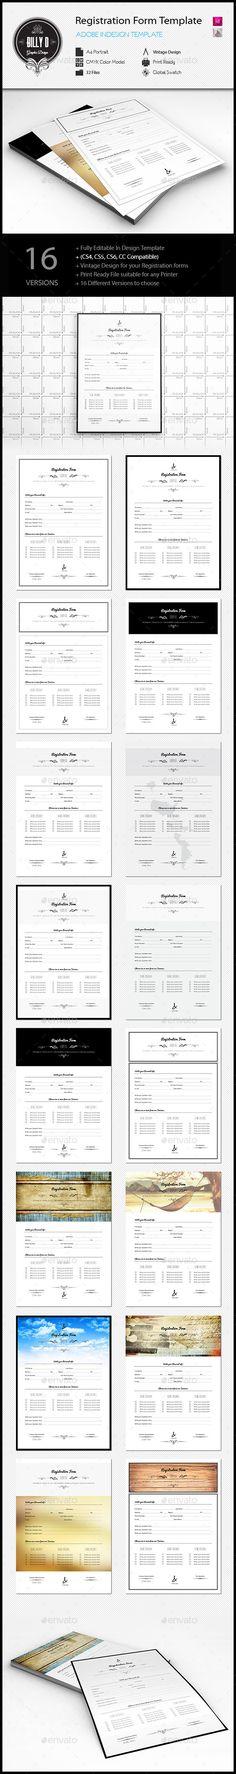 Registration Form Template (CS4, 21x29.7, a4, form, form template, indesign, registration form, vintage)